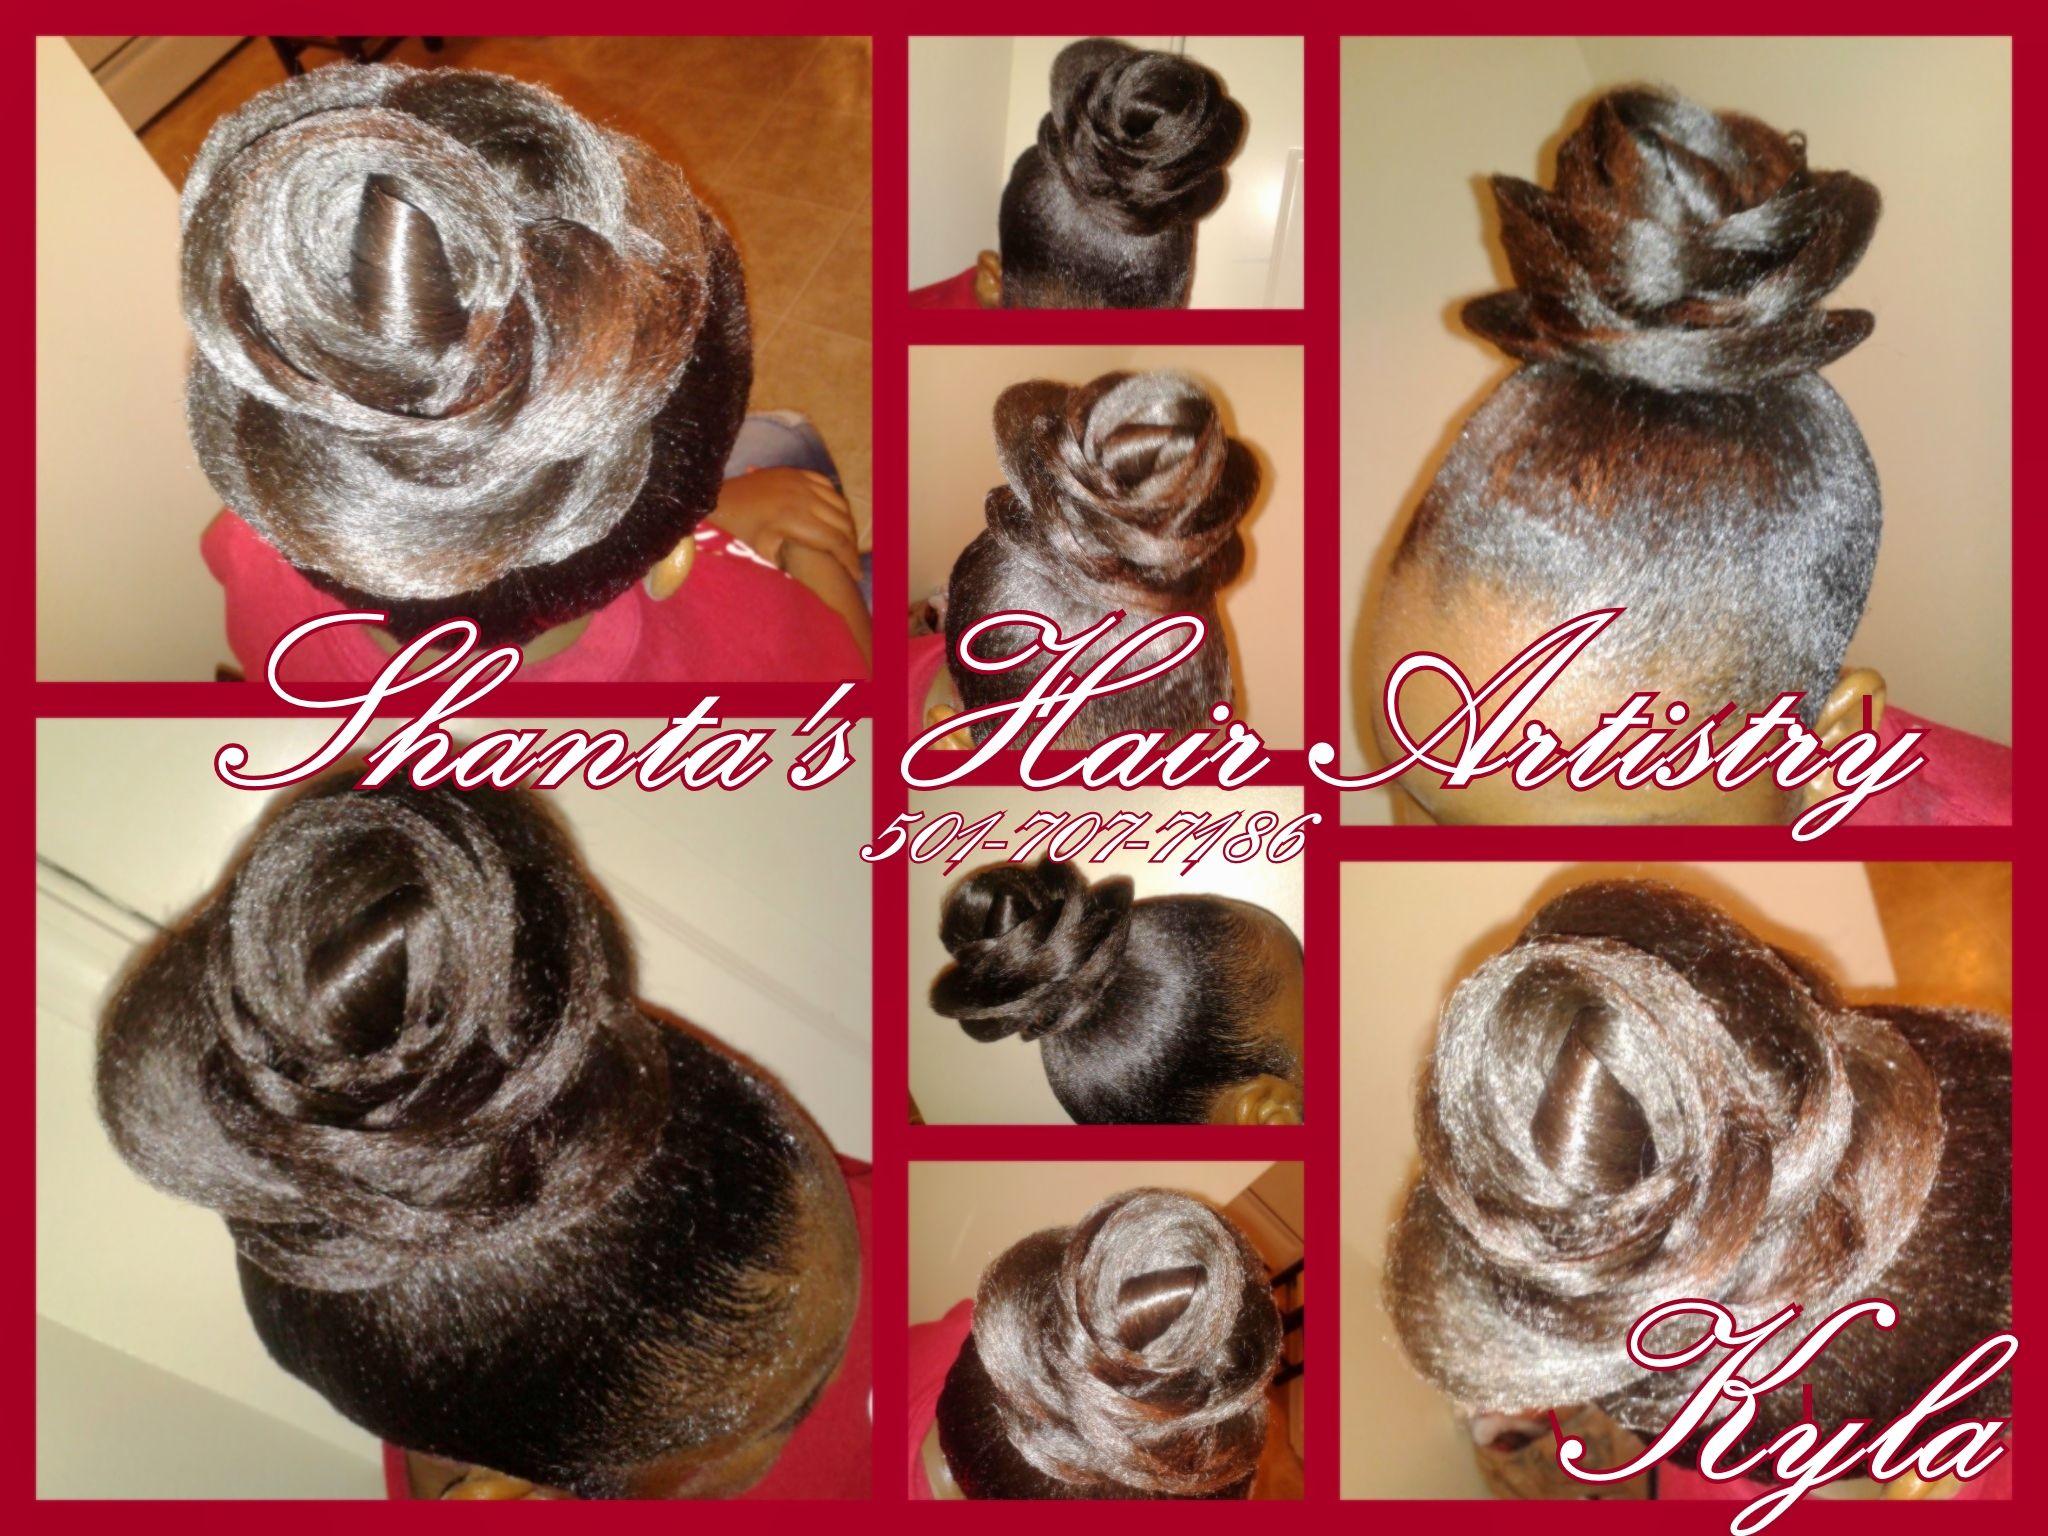 Little Rock Arkansas Hairstylist Flower Hair Updo Hairstyles Unique Wedding Creative Multicultural Stylist